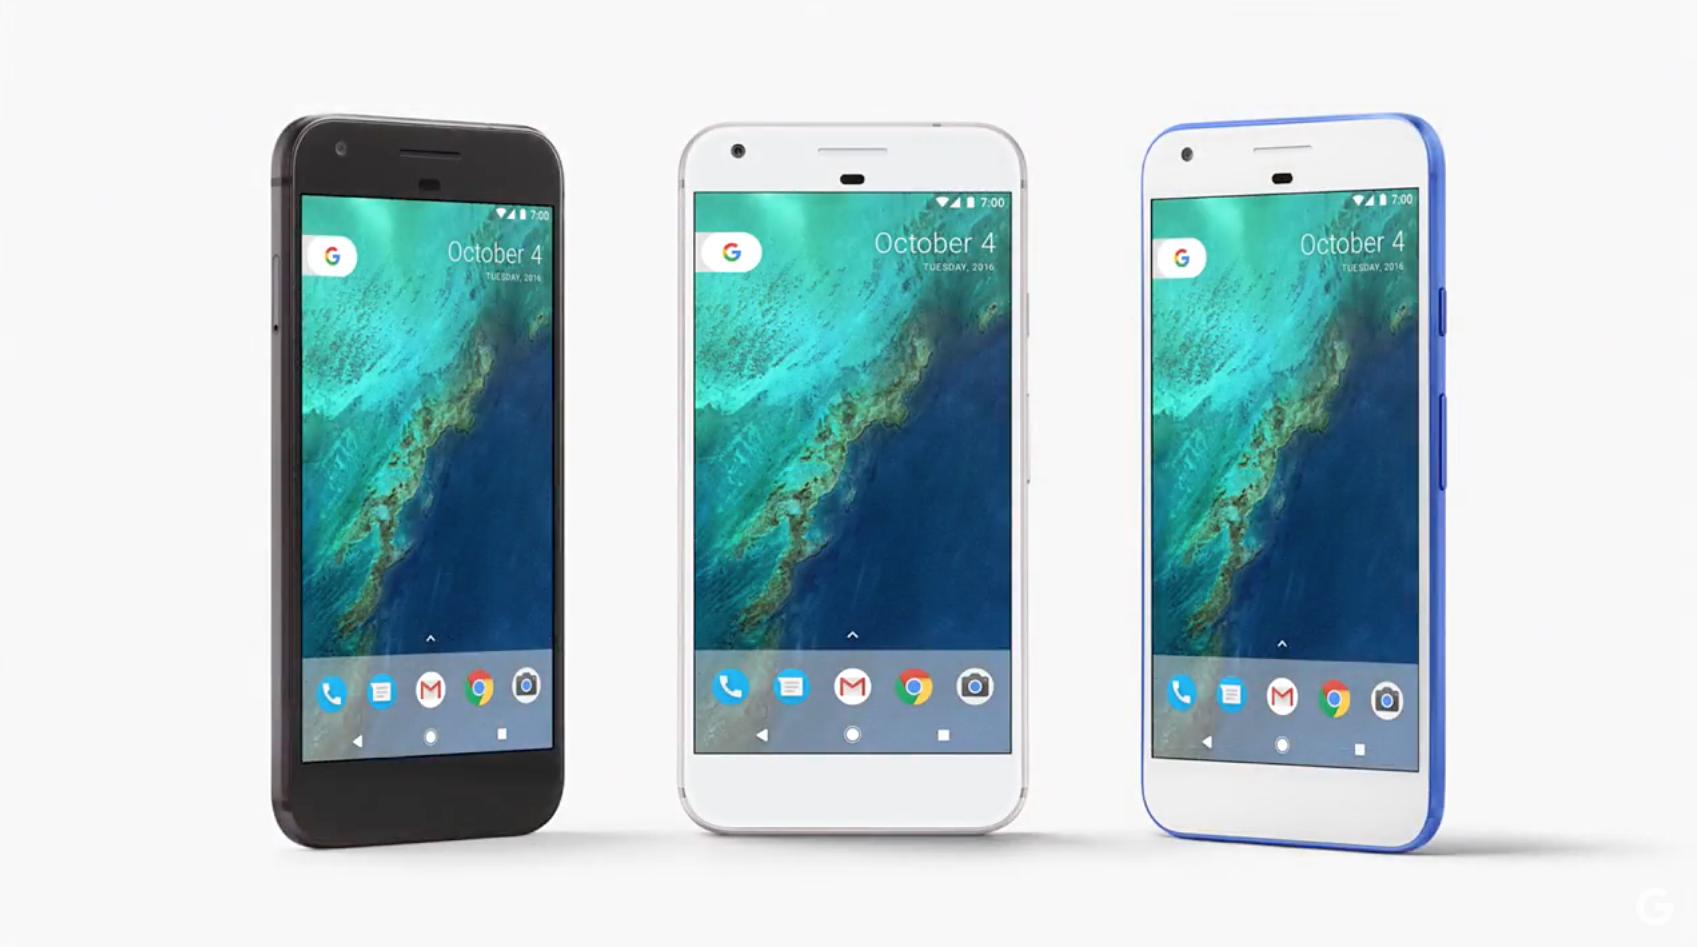 LGможет заняться производством телефонов Google Pixel 3